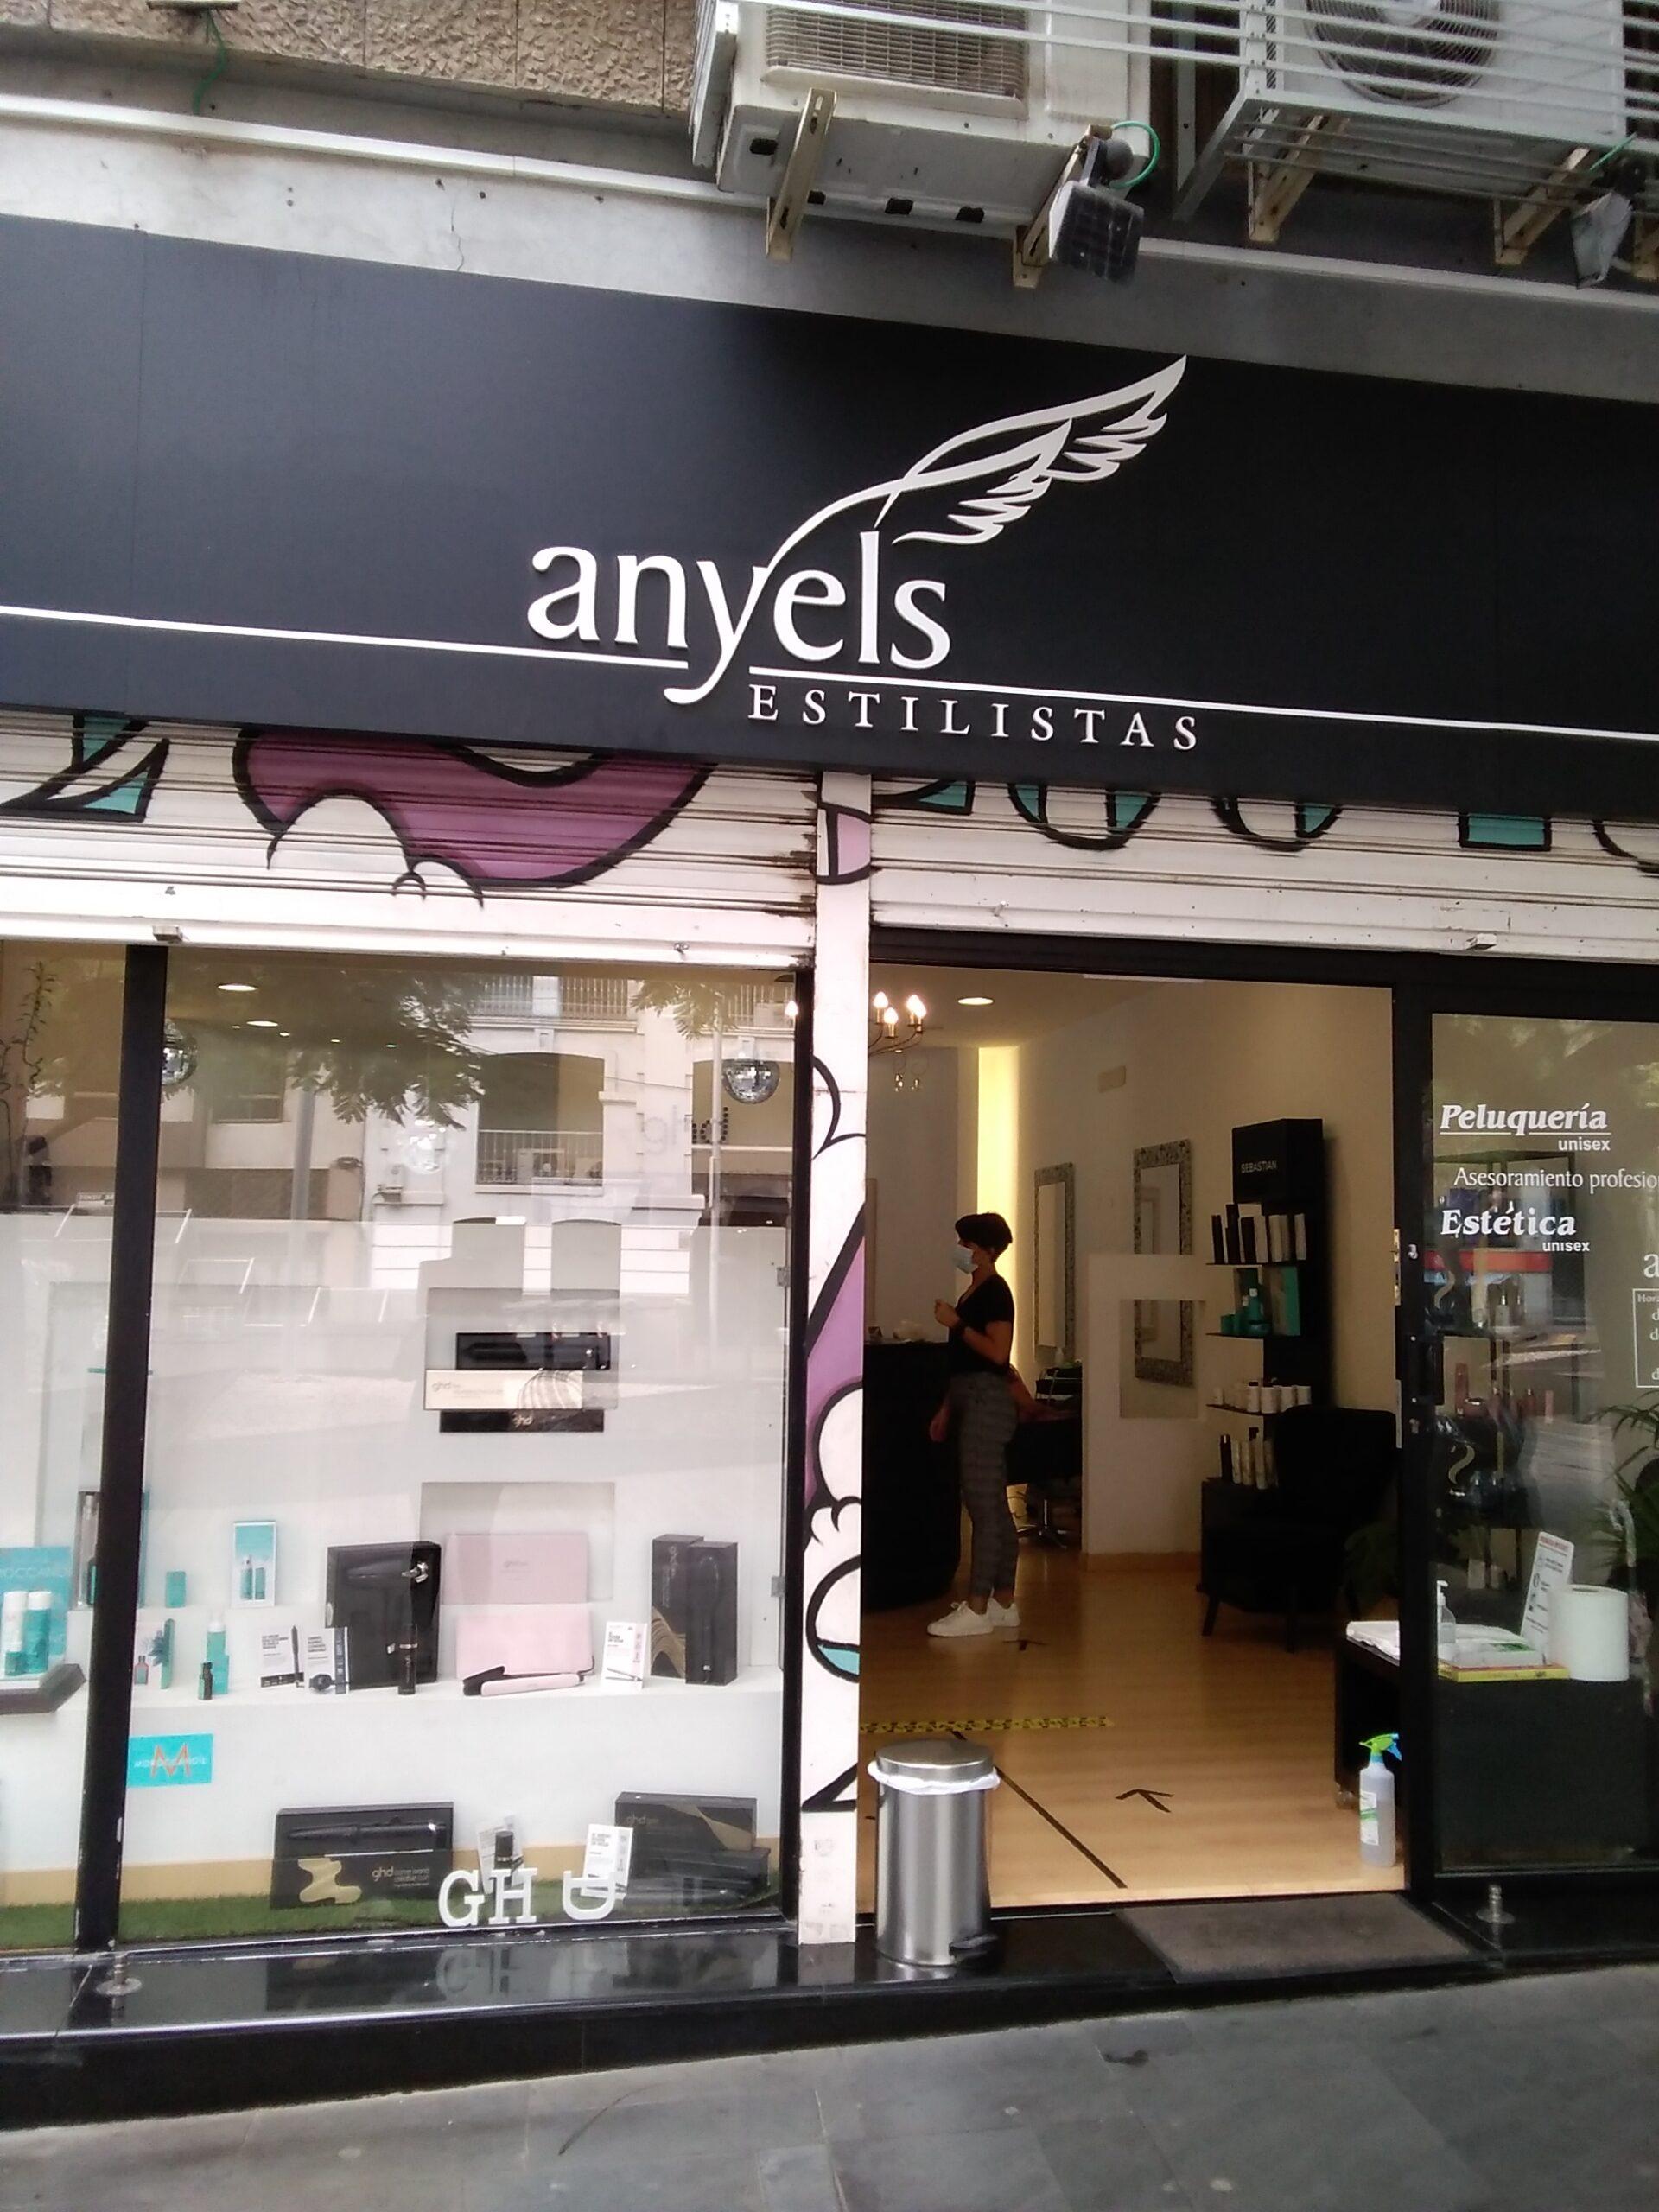 Anyels estilistas